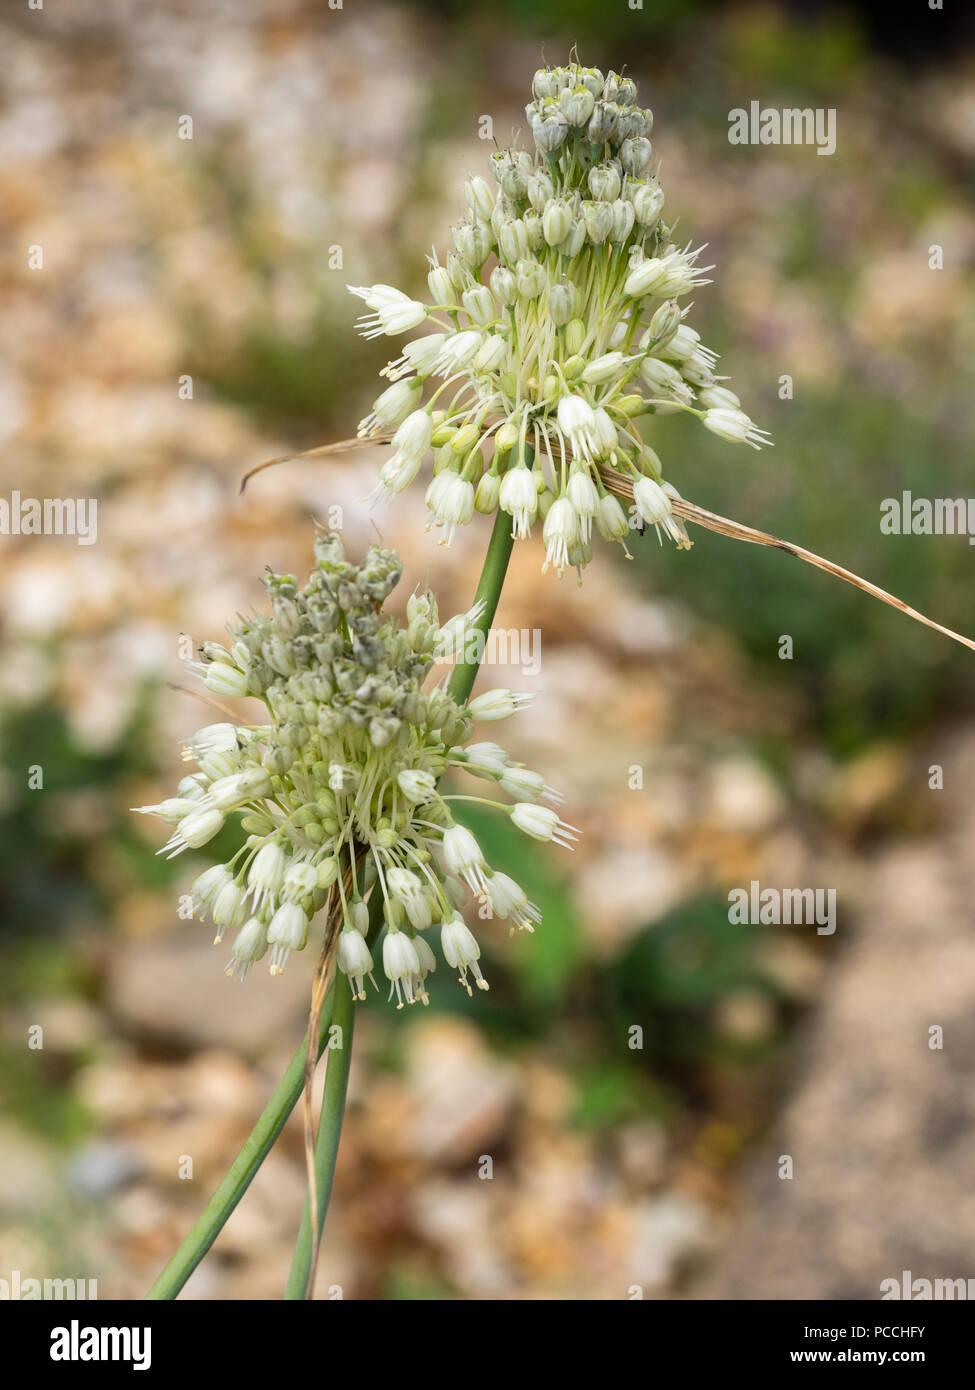 White, late summer flowers of the hardy ornamental onion, Allium carinatum ssp. pulchellum f. album - Stock Image